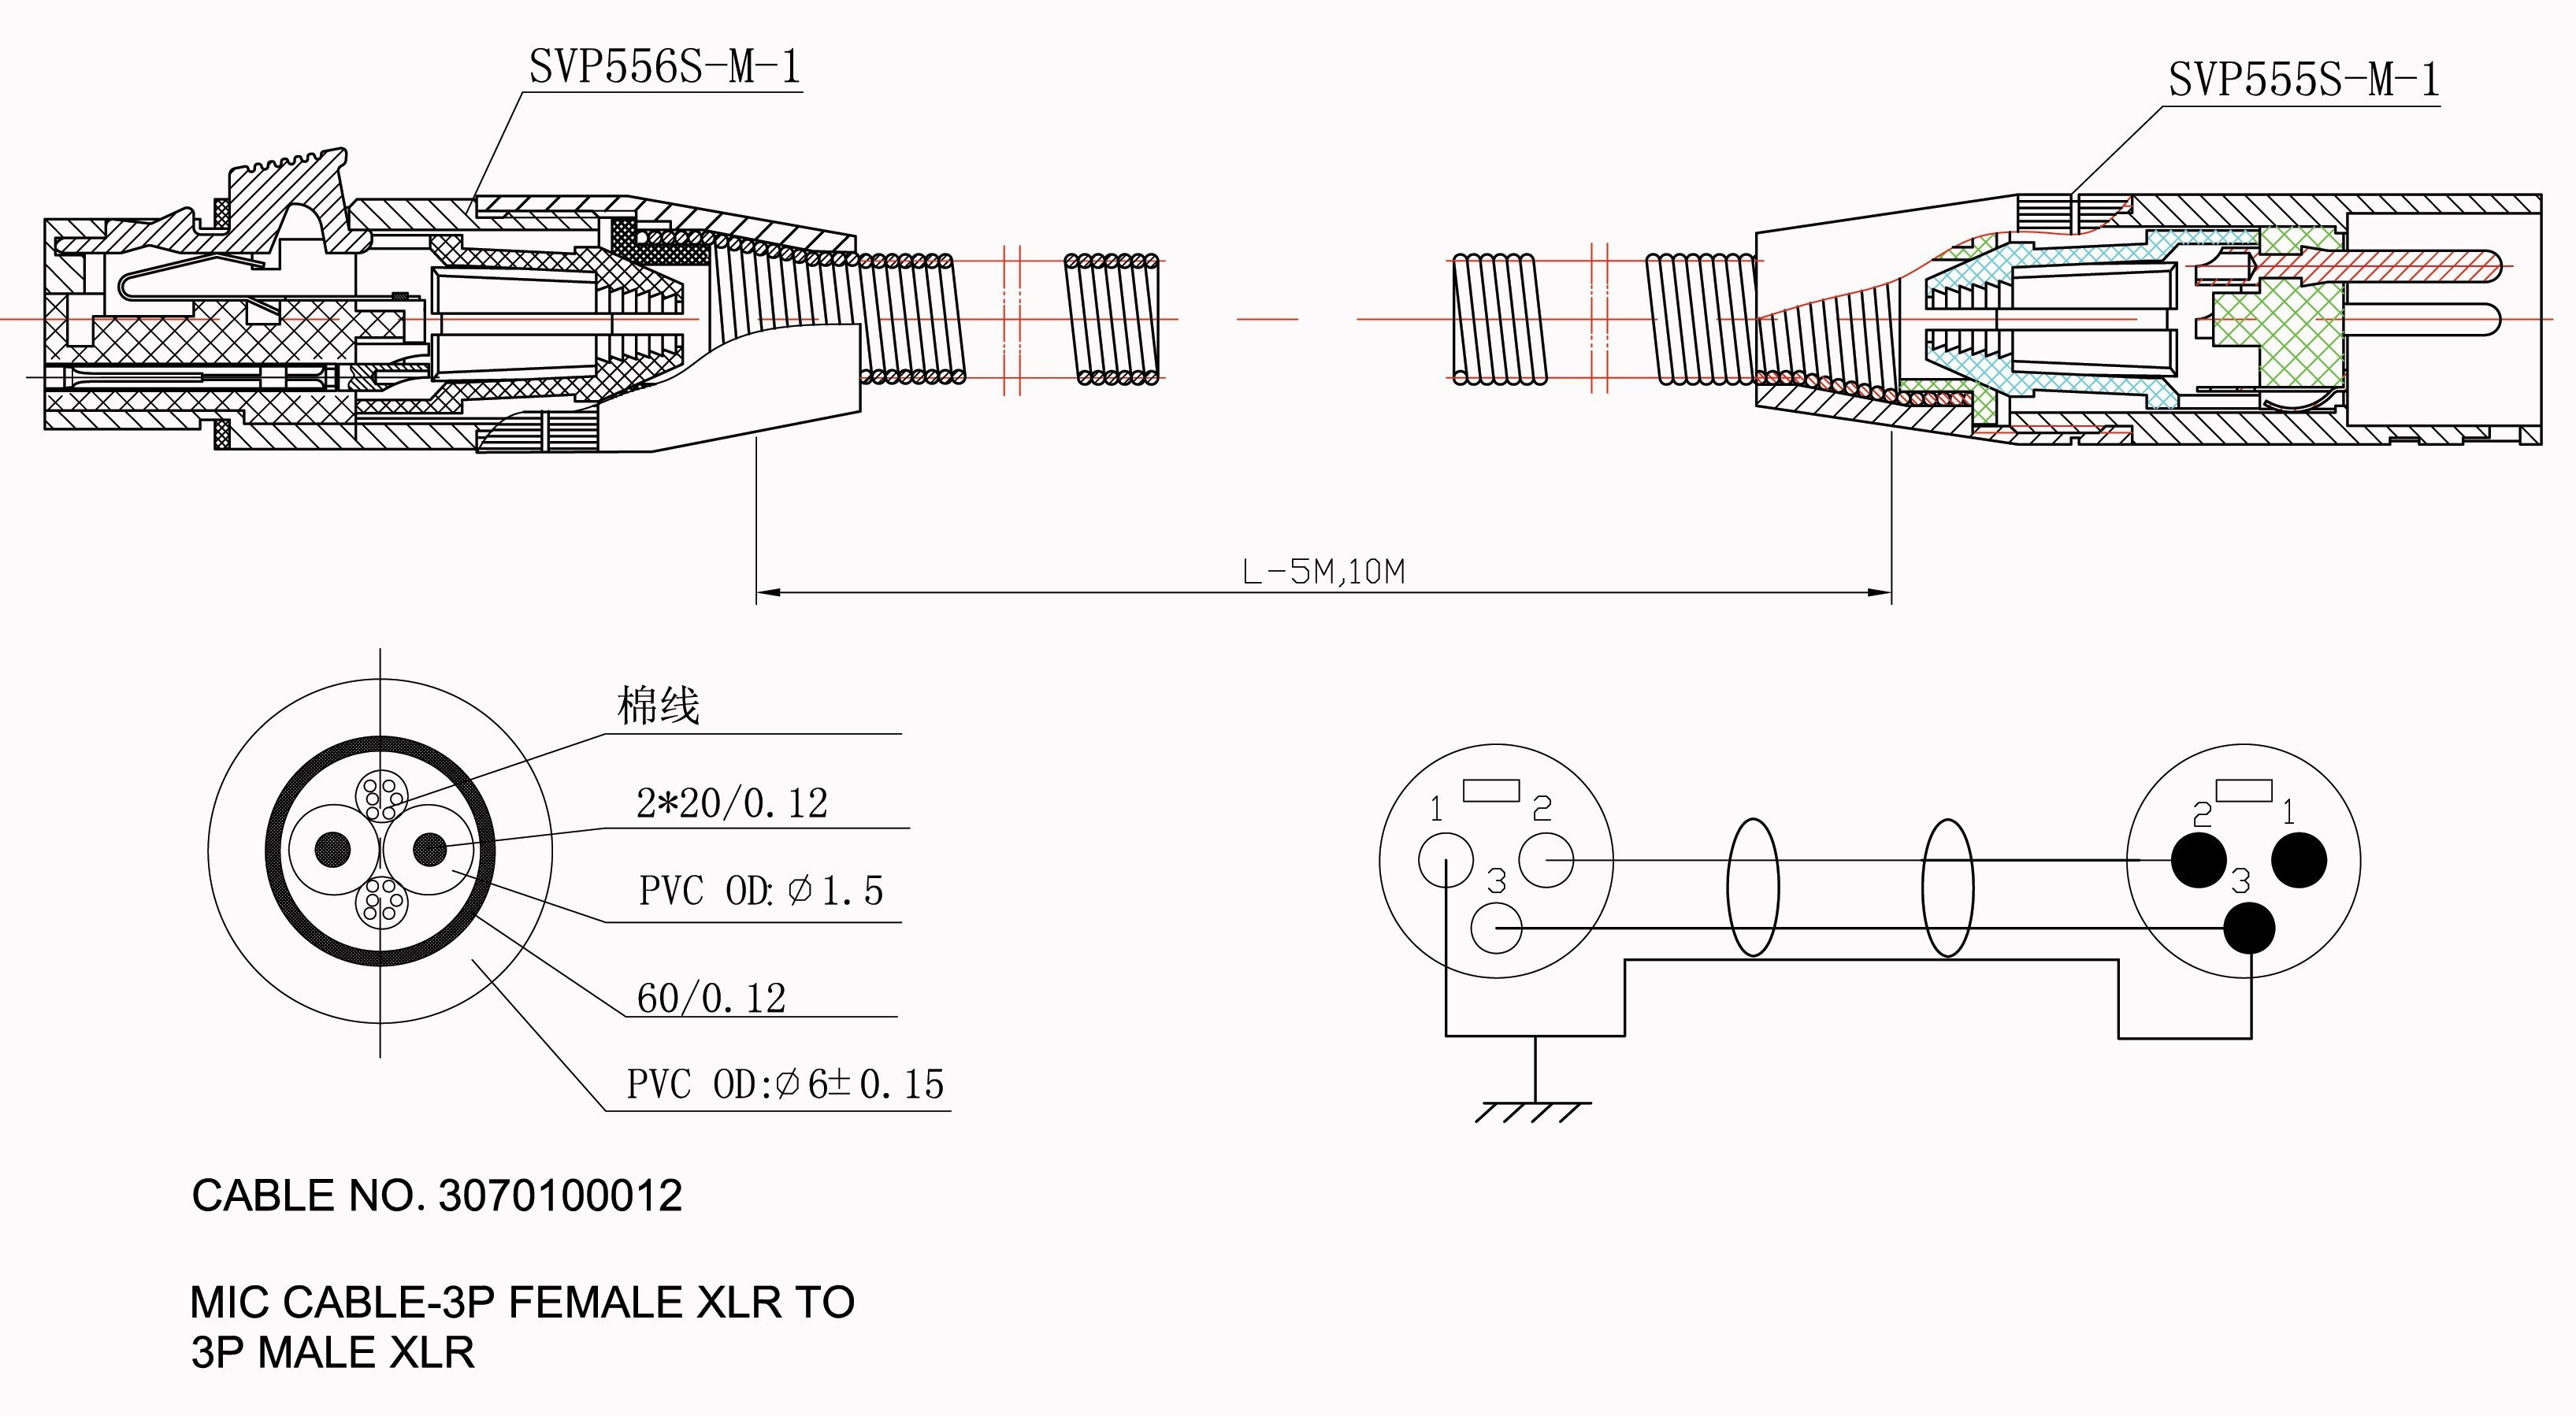 crutchfield 5 channel amp wiring diagram te 5765  crutchfield wiring guide crutchfield circuit diagrams  te 5765  crutchfield wiring guide